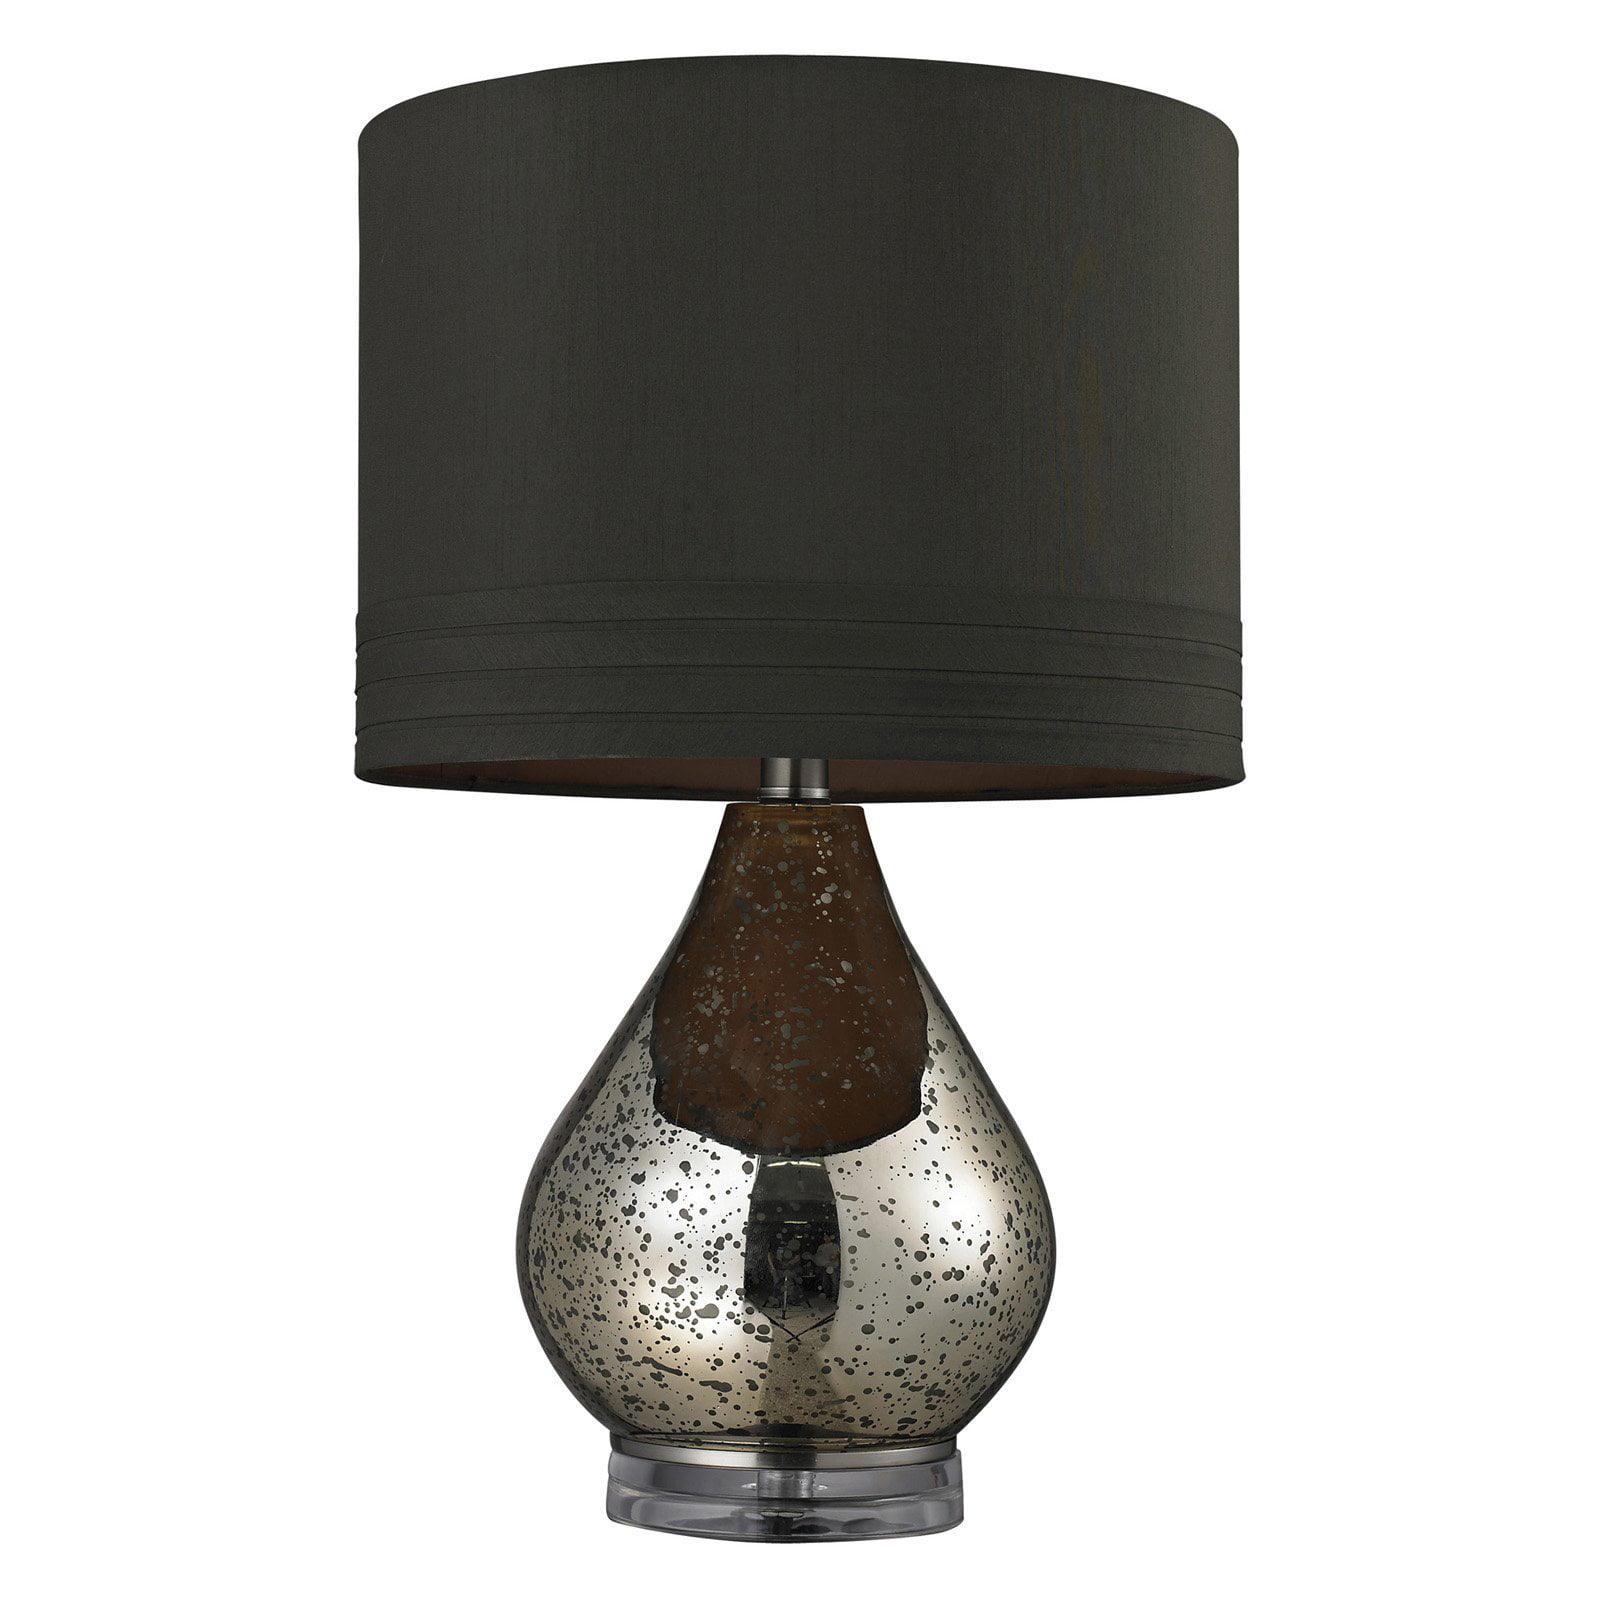 Dimond Lighting Antique Mercury Glass Table Lamp Walmart Com Walmart Com